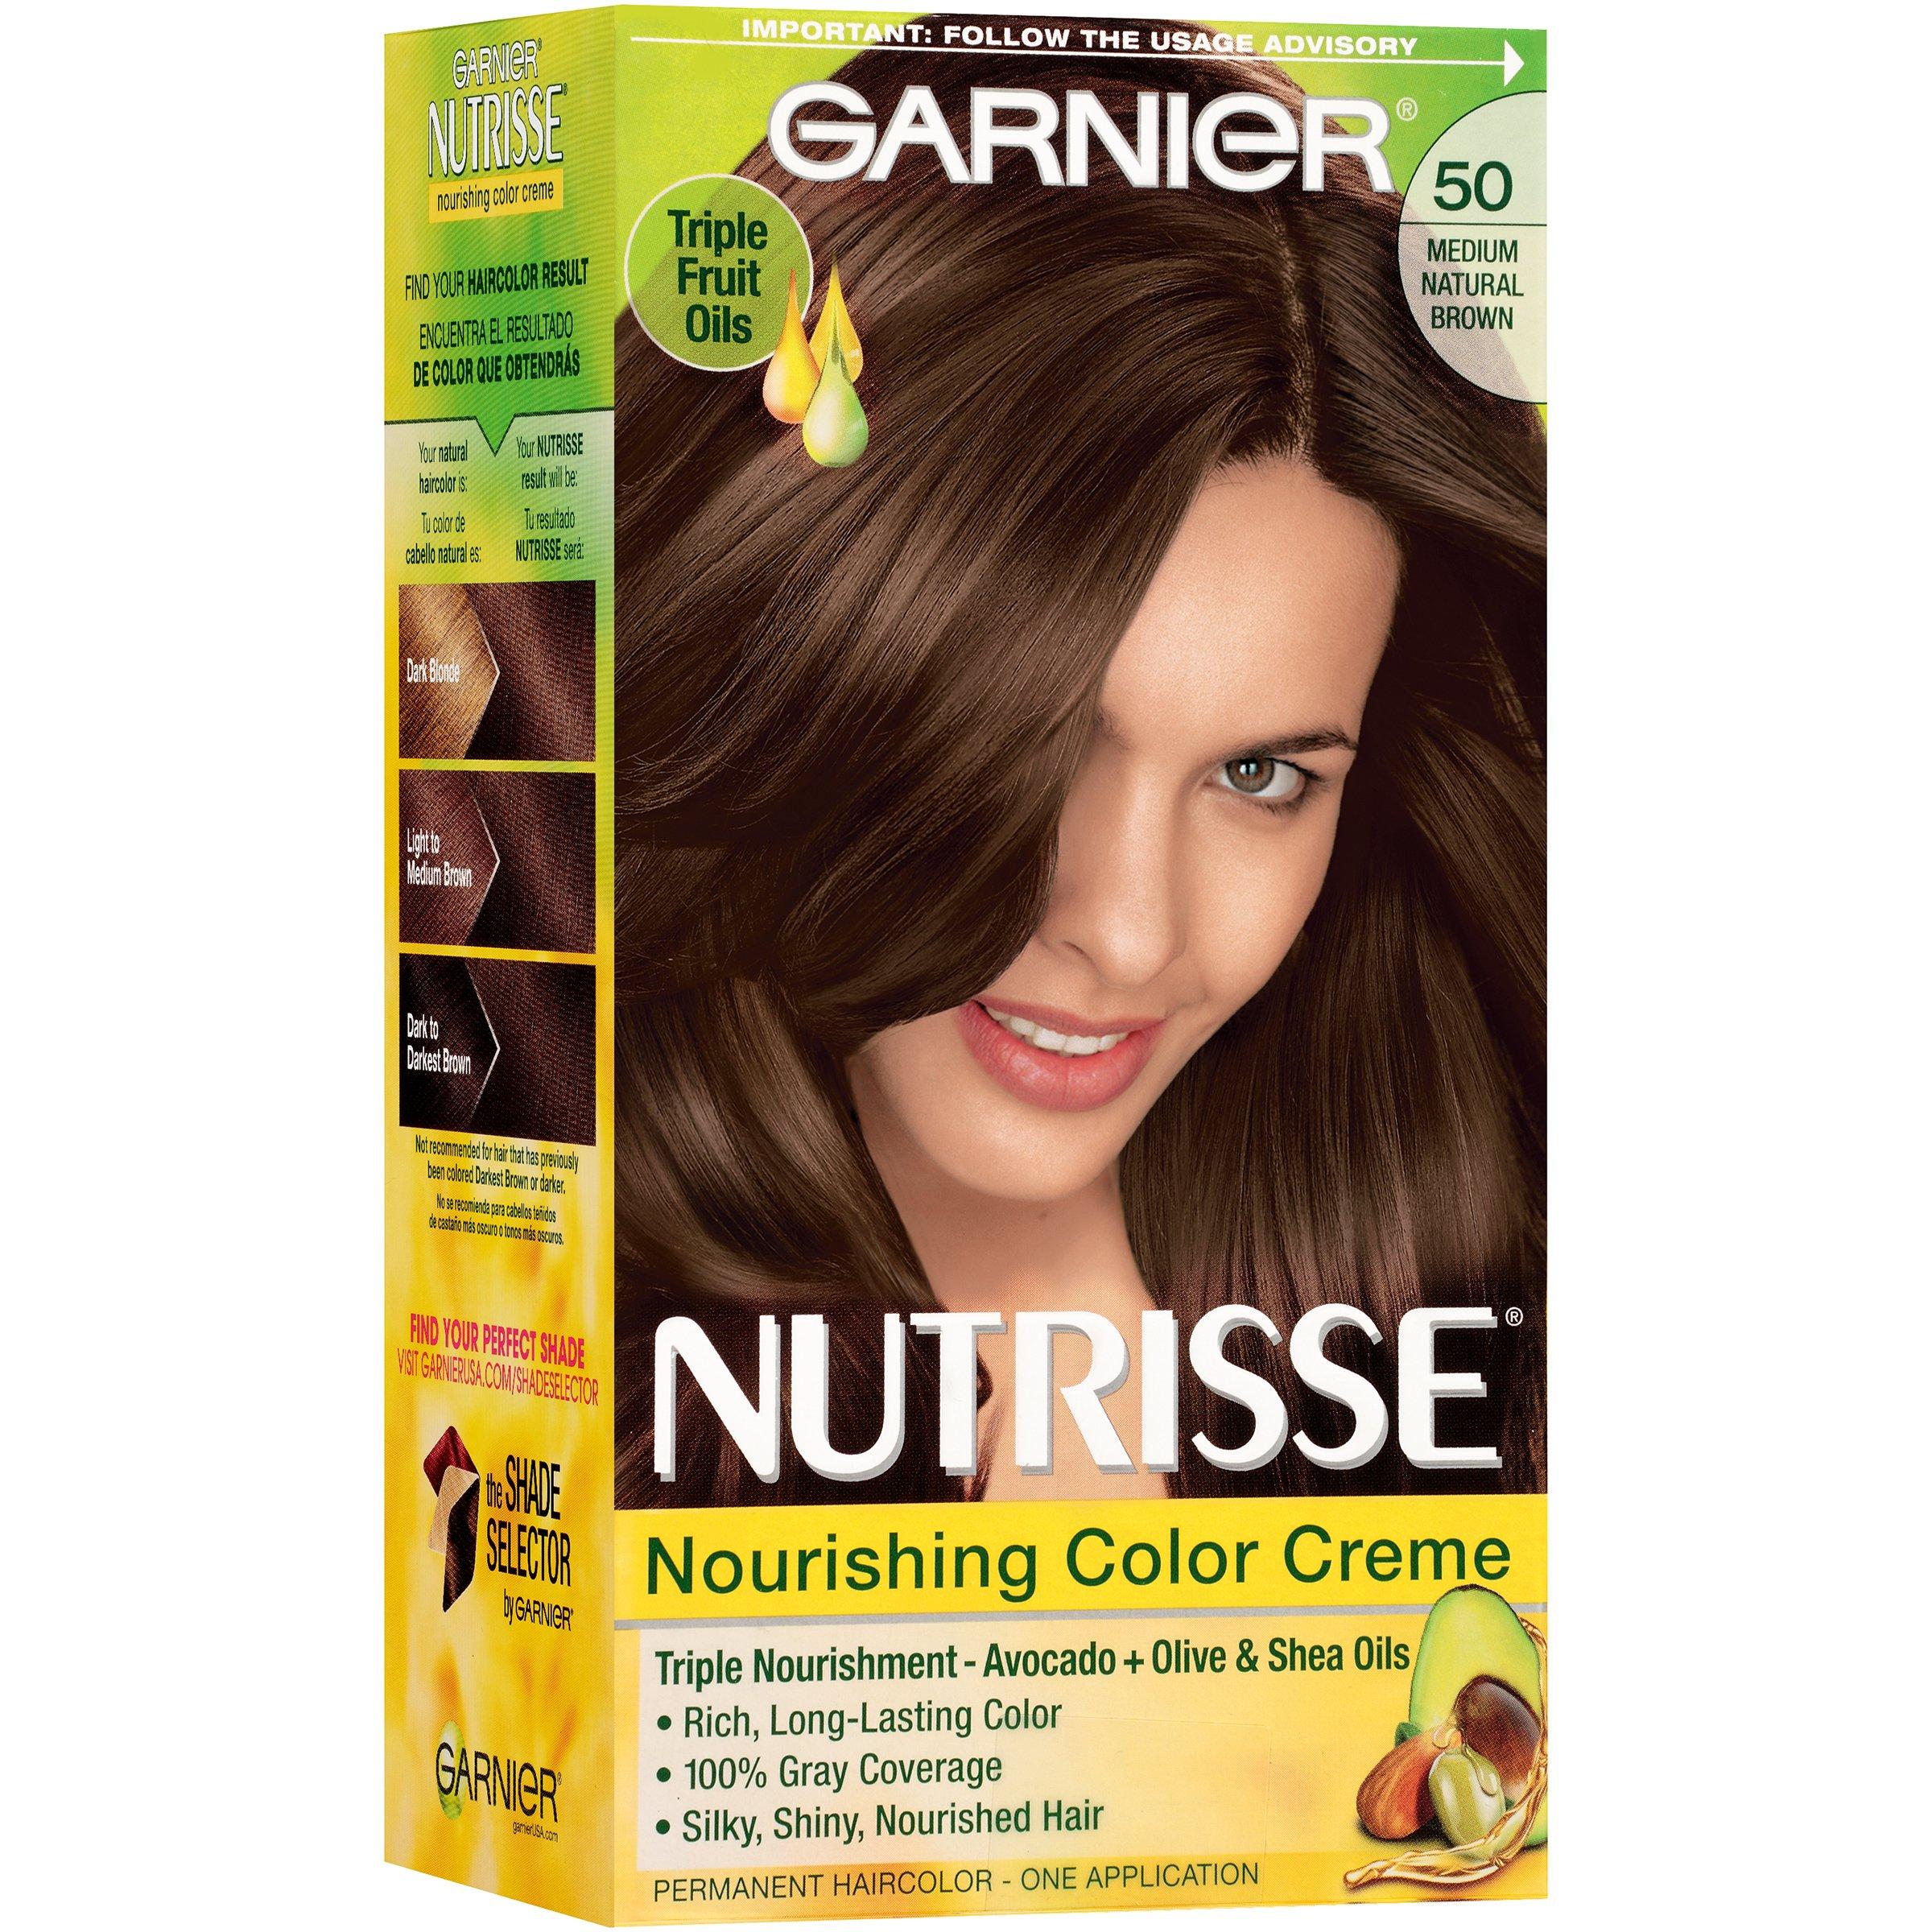 Garnier Nutrisse Nourishing Color Creme Hair Color 50 Medium Natural Brown